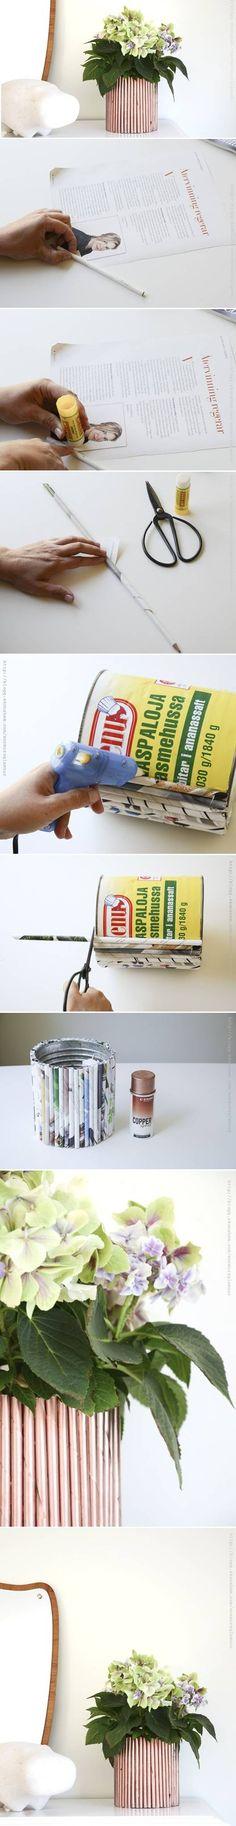 DIY Newspaper Decor Flower Pot DIY Newspaper Decor Flower Pot by diyforever